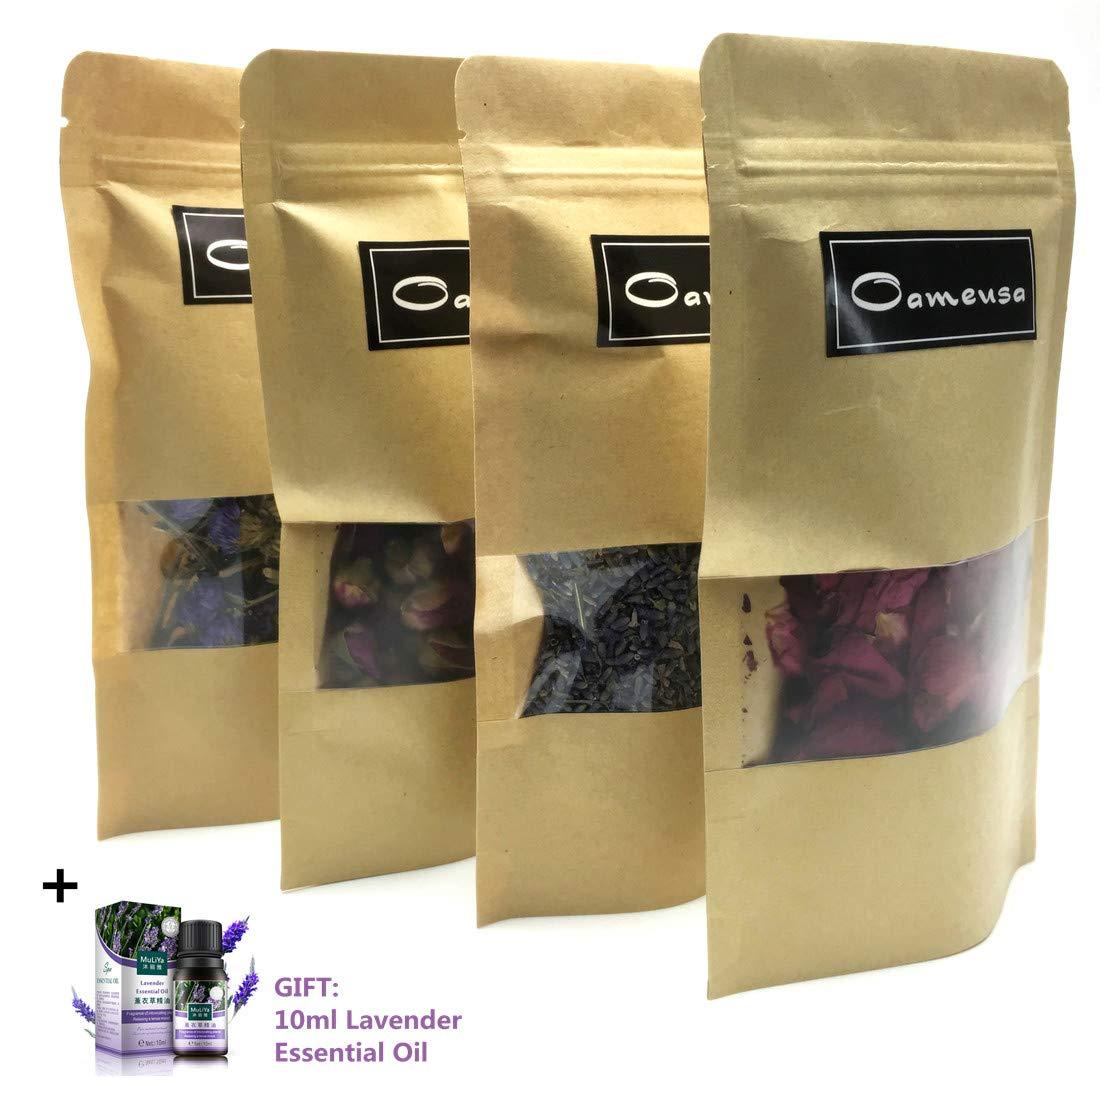 Dried Flowers- Pink Rose, Lavender,Roseleaf, Myosotis sylvatica- Dried Flowers Soap Making Kit - Bath Bomb Kit - Pressed Flowers Herbs for Resin -Bonus + lavender essential oil Oameusa